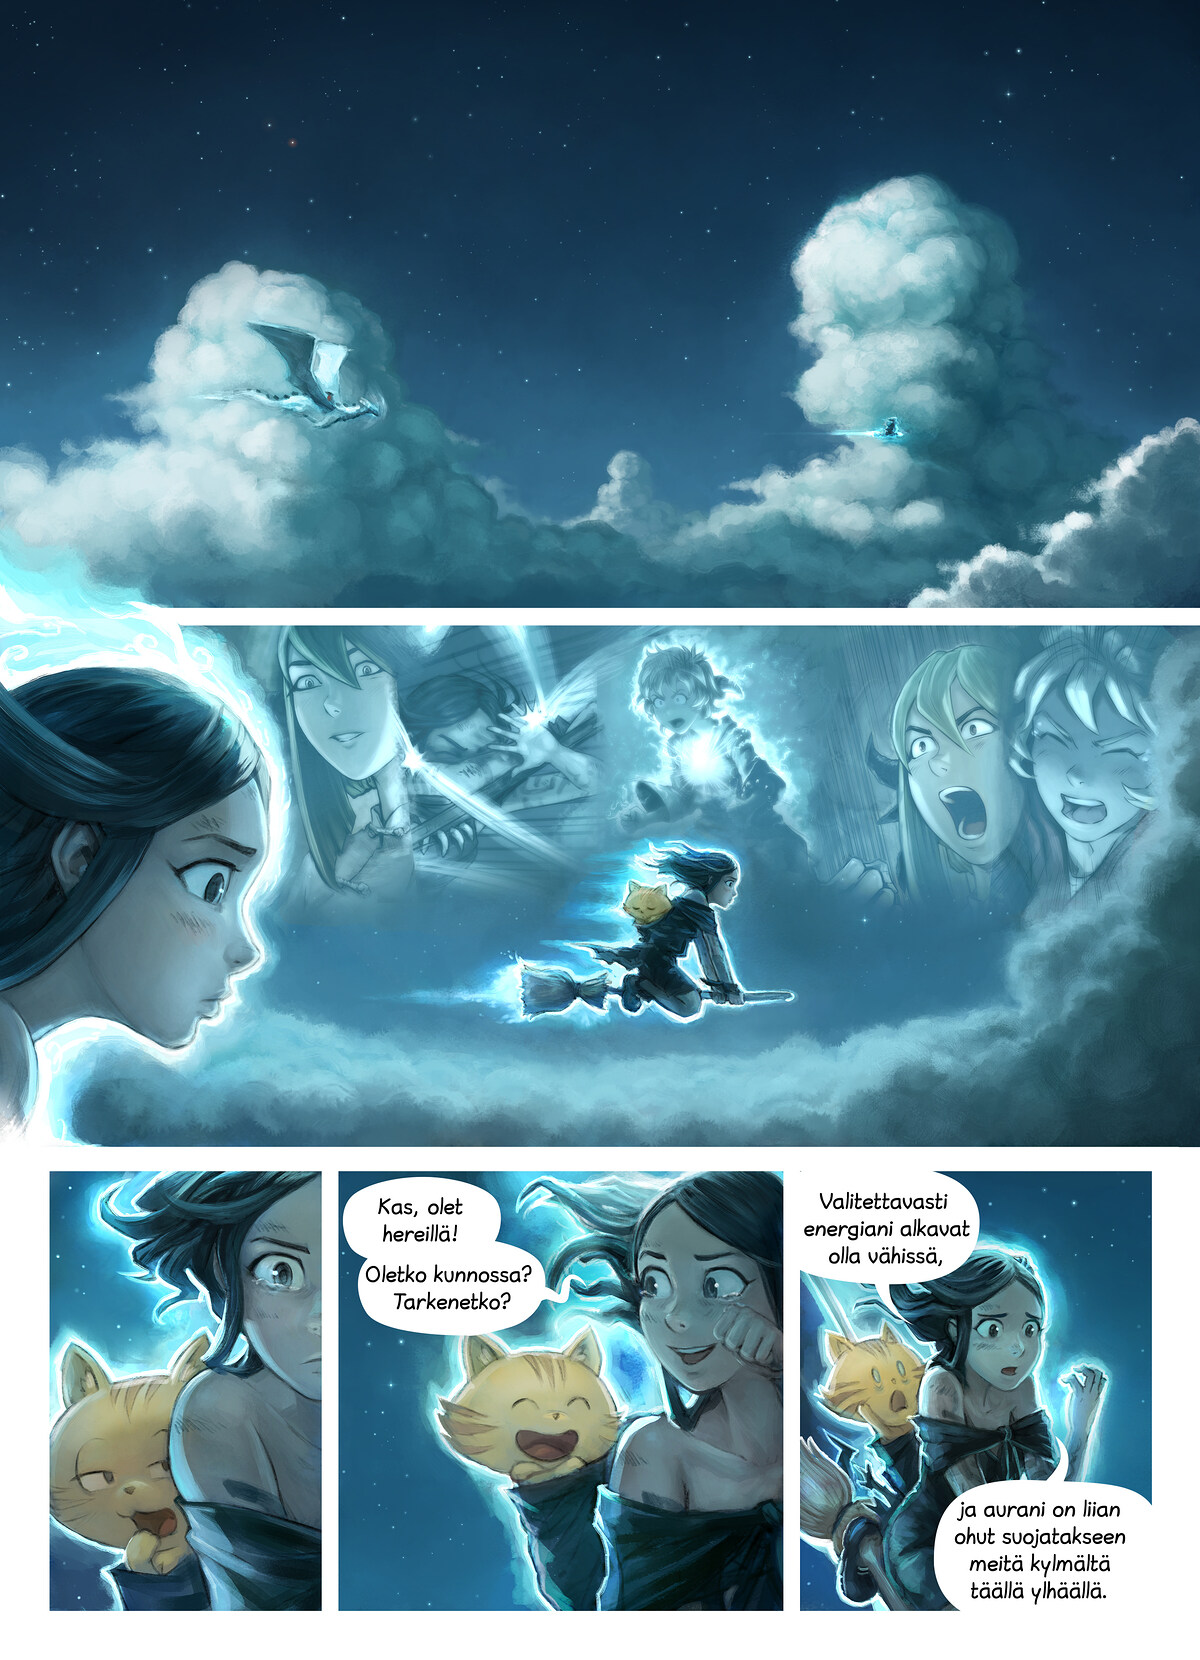 Episodi 35: Heijastus, Page 1